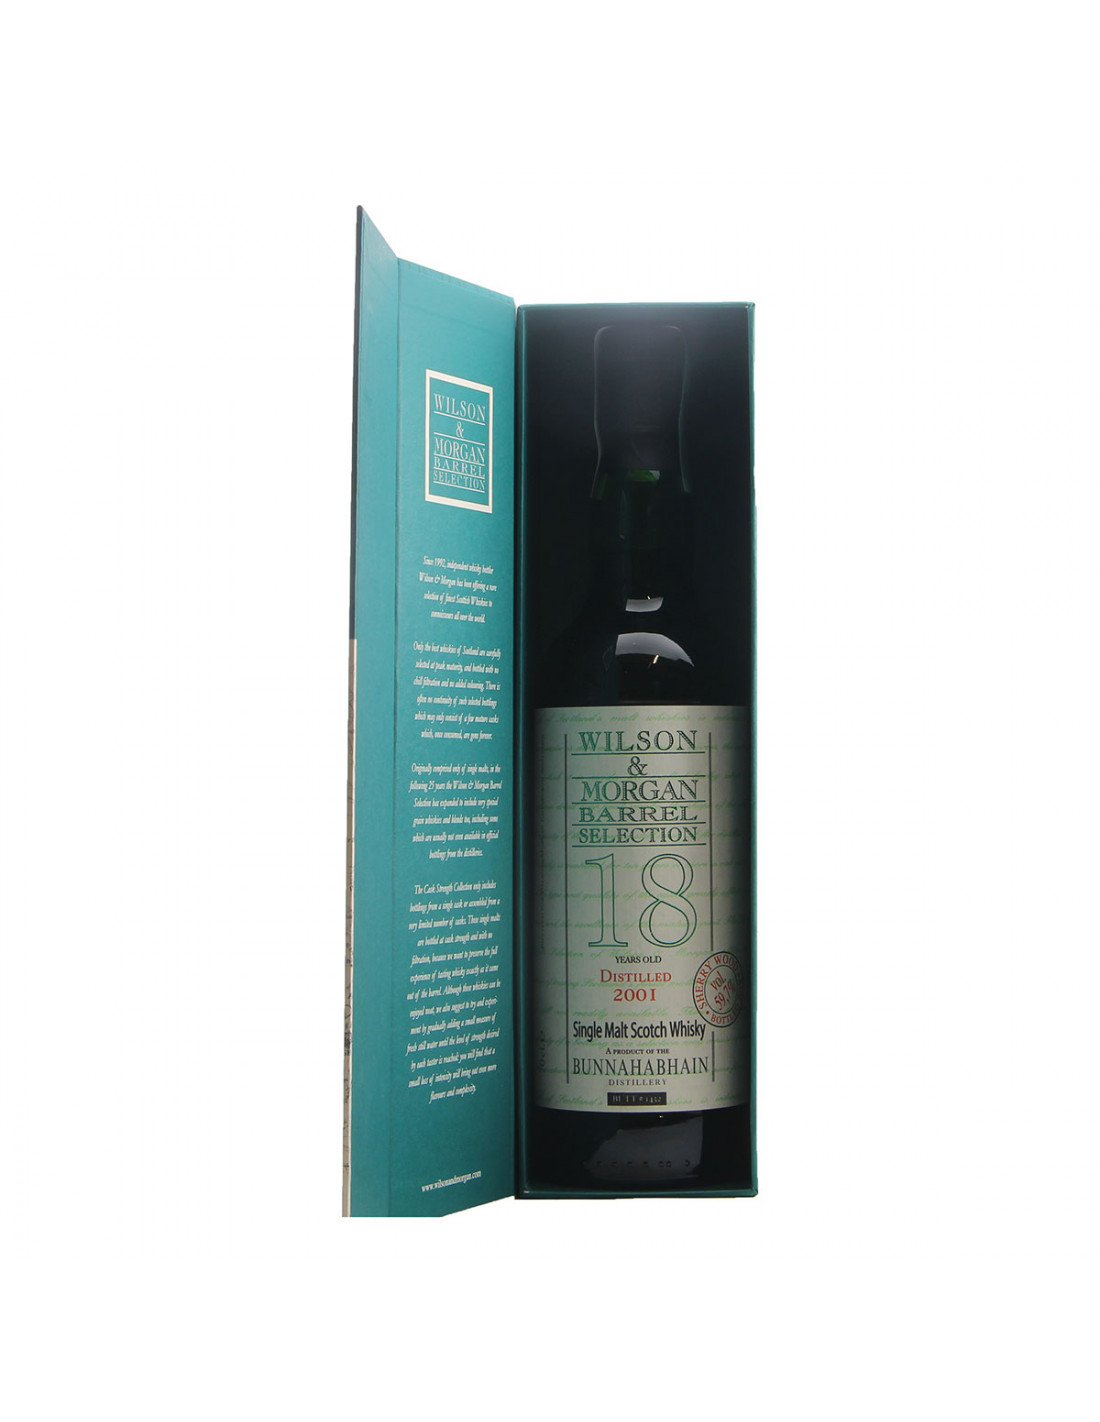 Wilson & Morgan Whisky 18YO Bunnahanhain Sherry Wood Grandi Bottiglie